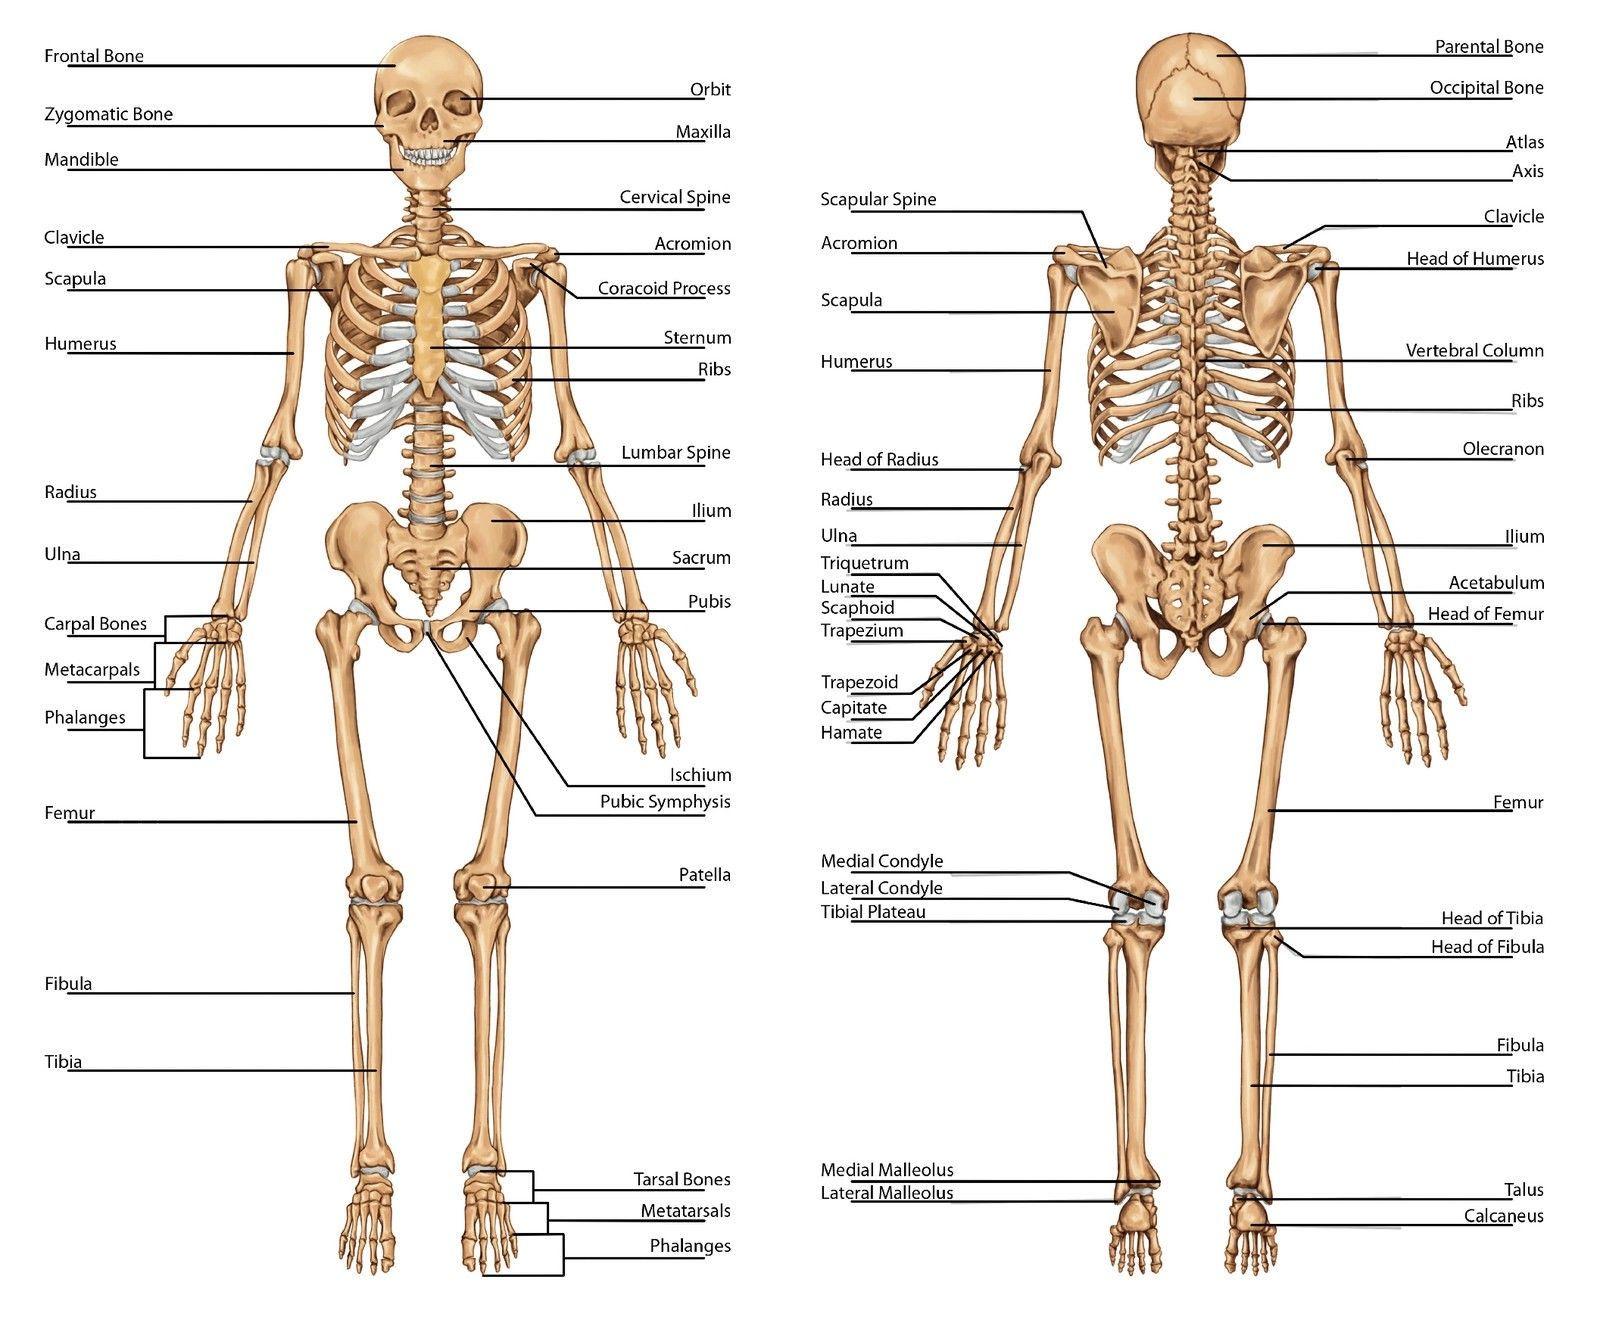 diagram of the human body skeleton inspirational skeleton anatomy rh pinterest fr human skeleton diagram human bone structure diagram [ 1600 x 1320 Pixel ]